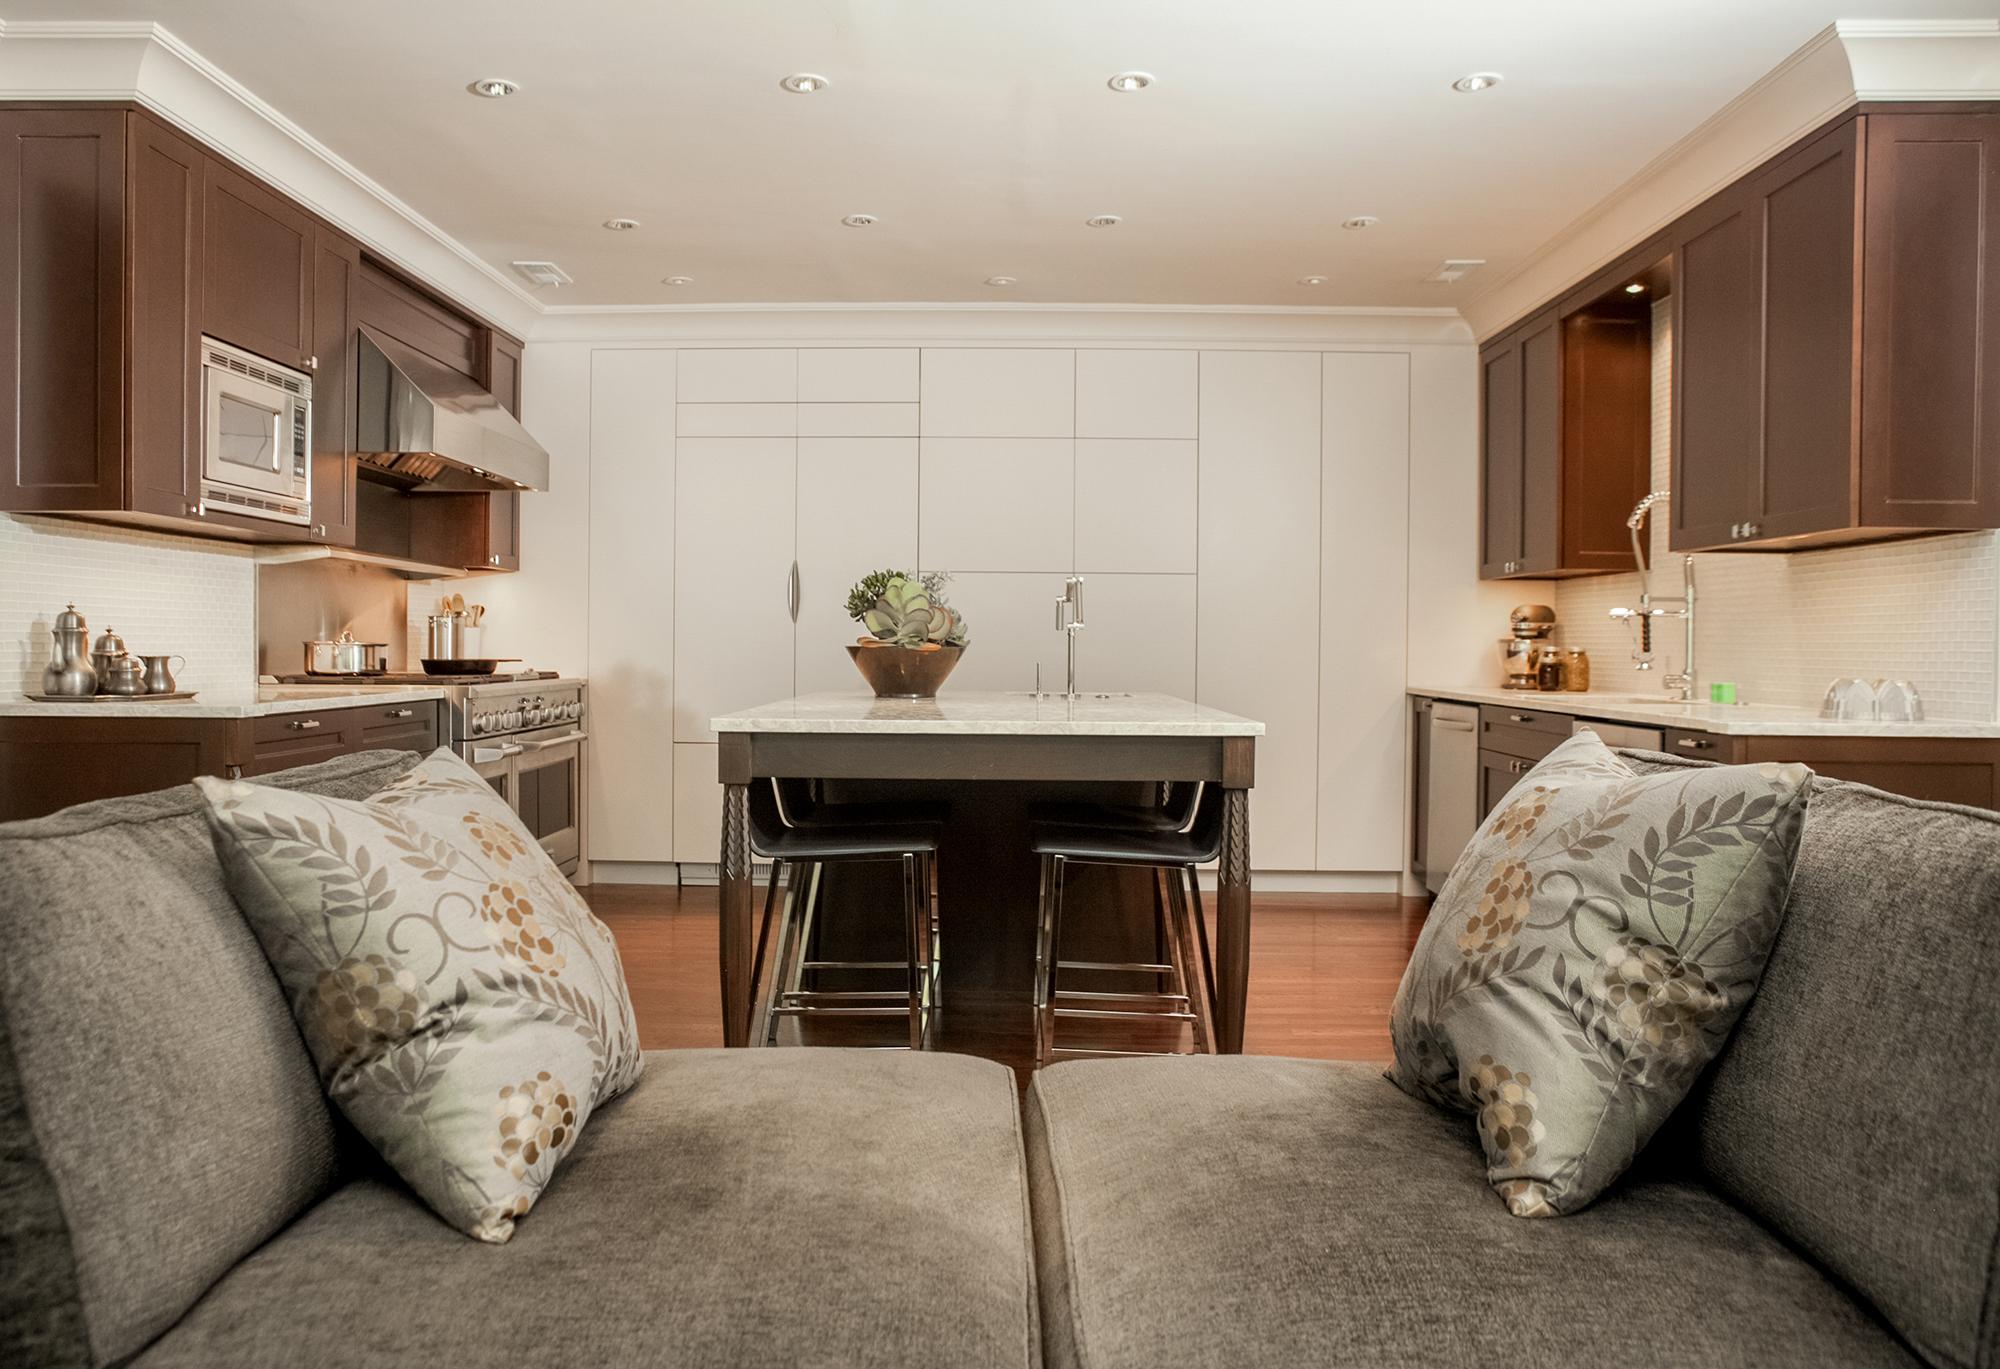 05 concealed cabinetry.jpg